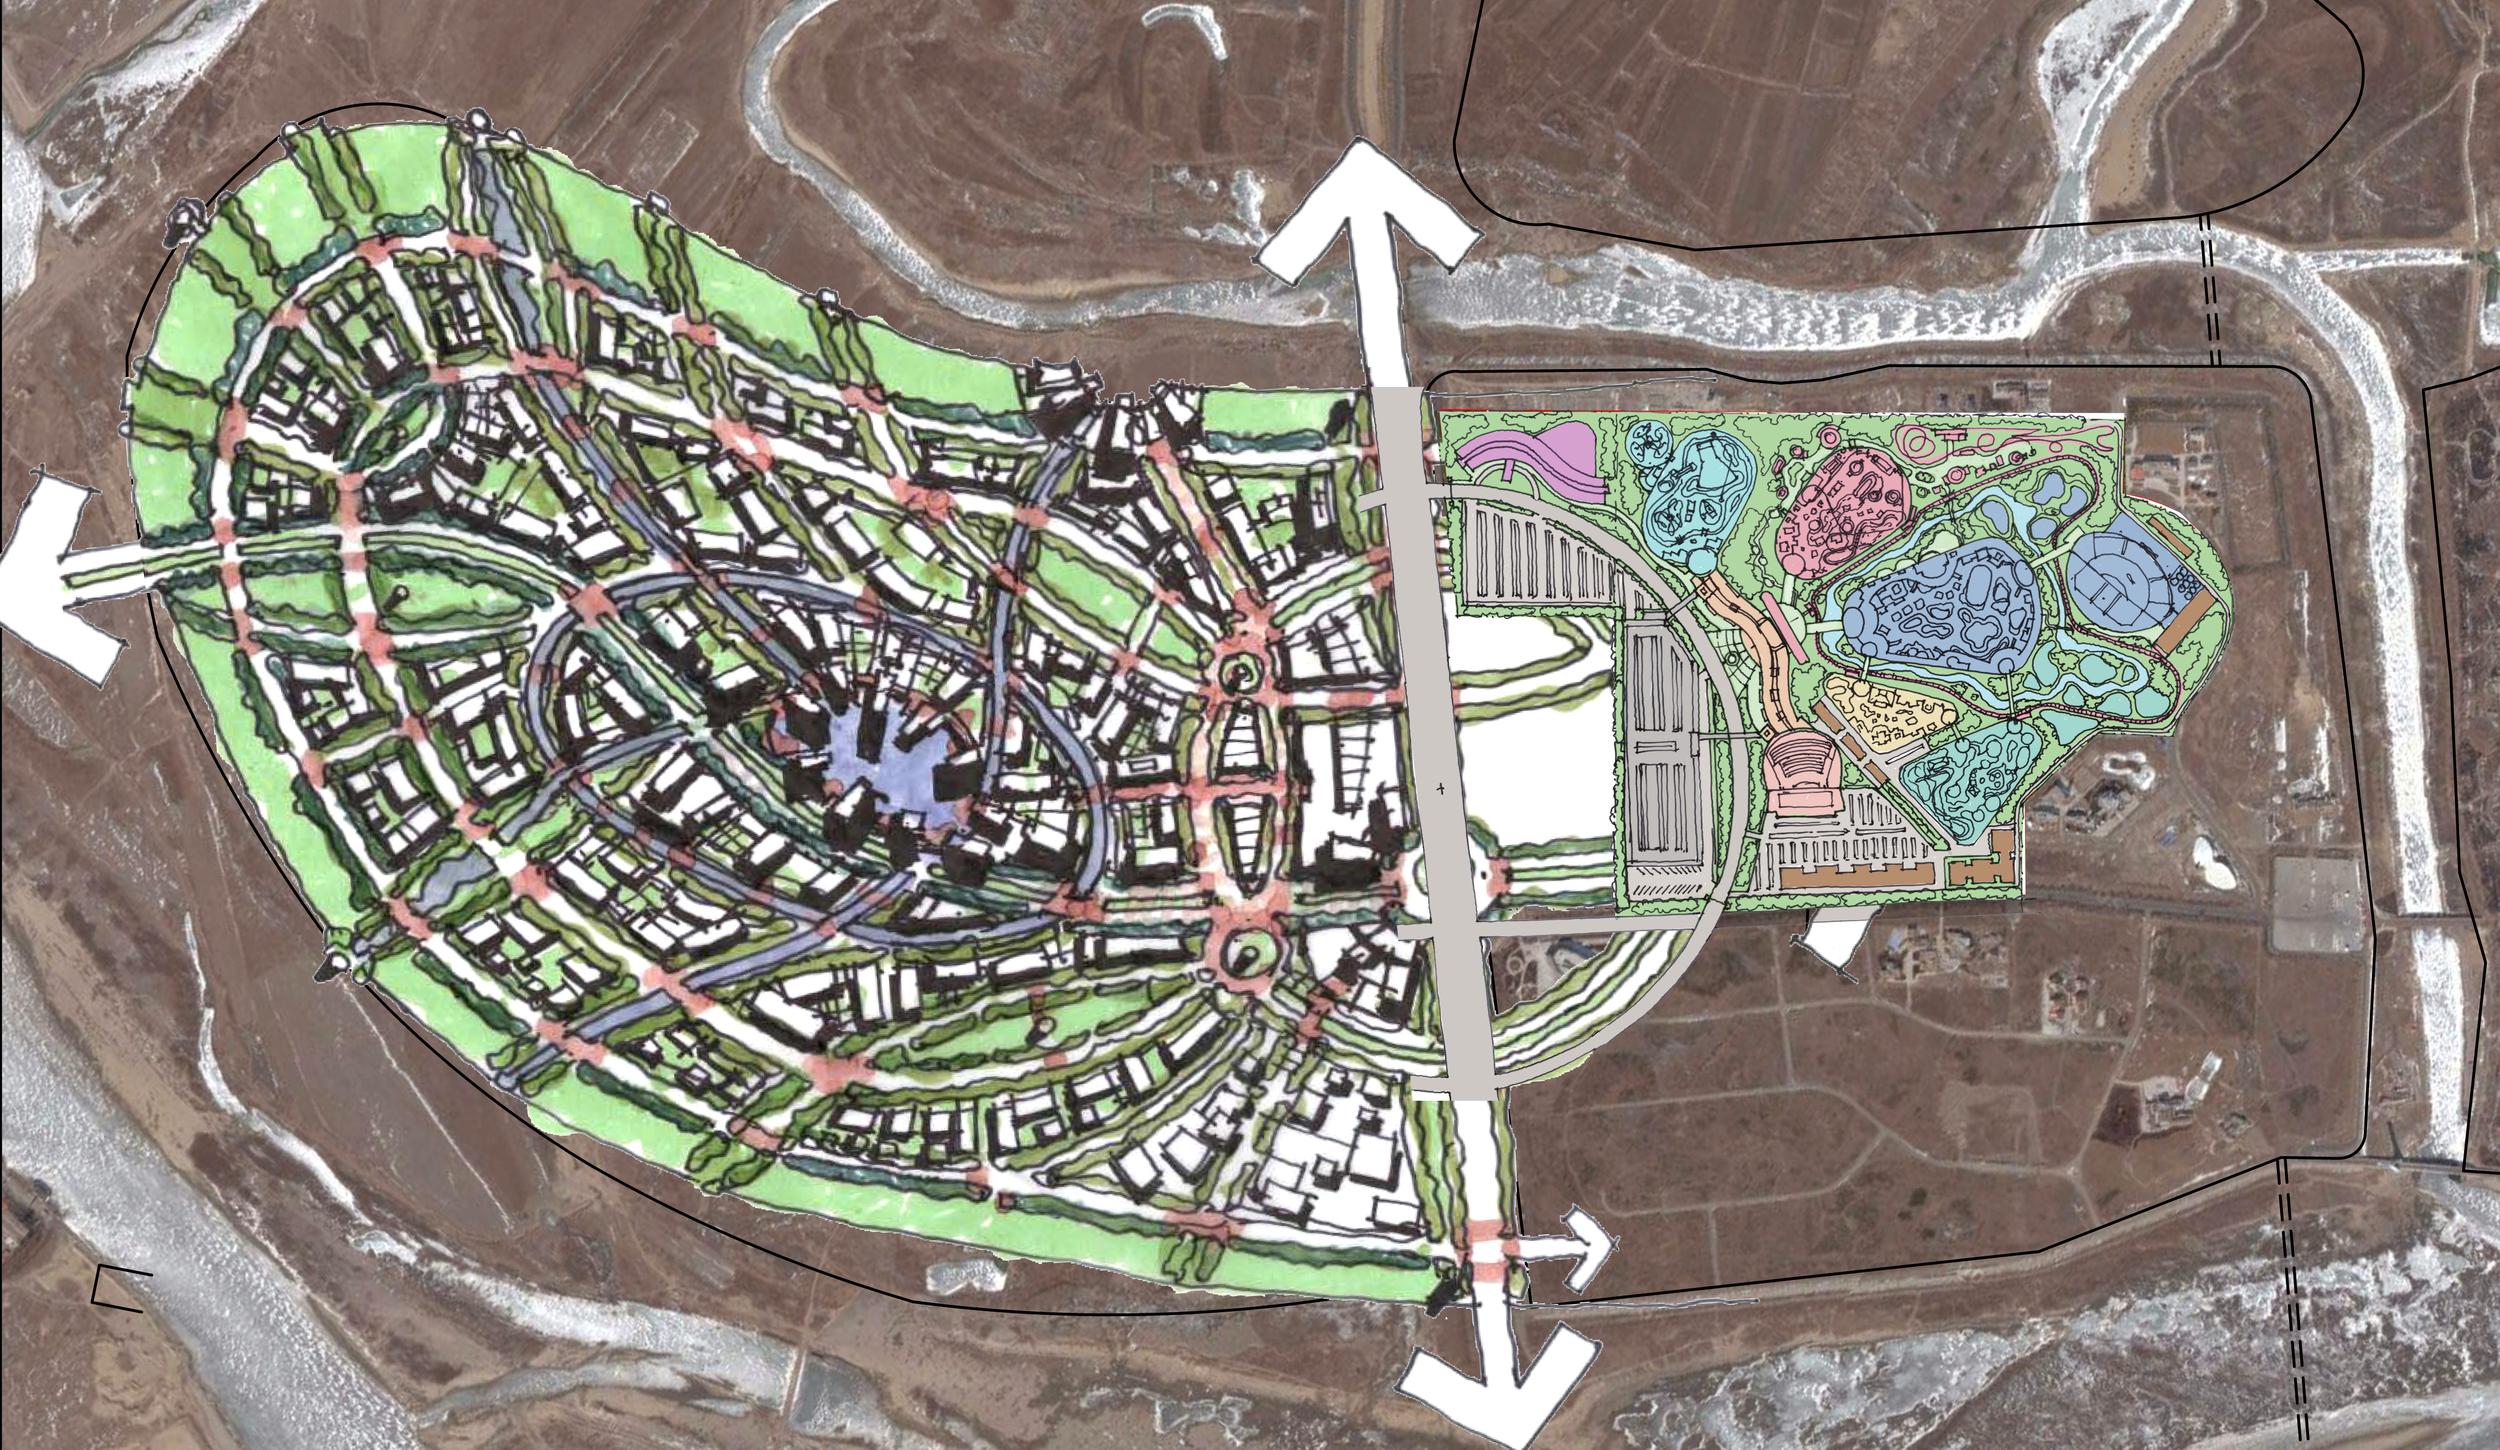 rtkl vertex consolidated plan 125k copy.jpg